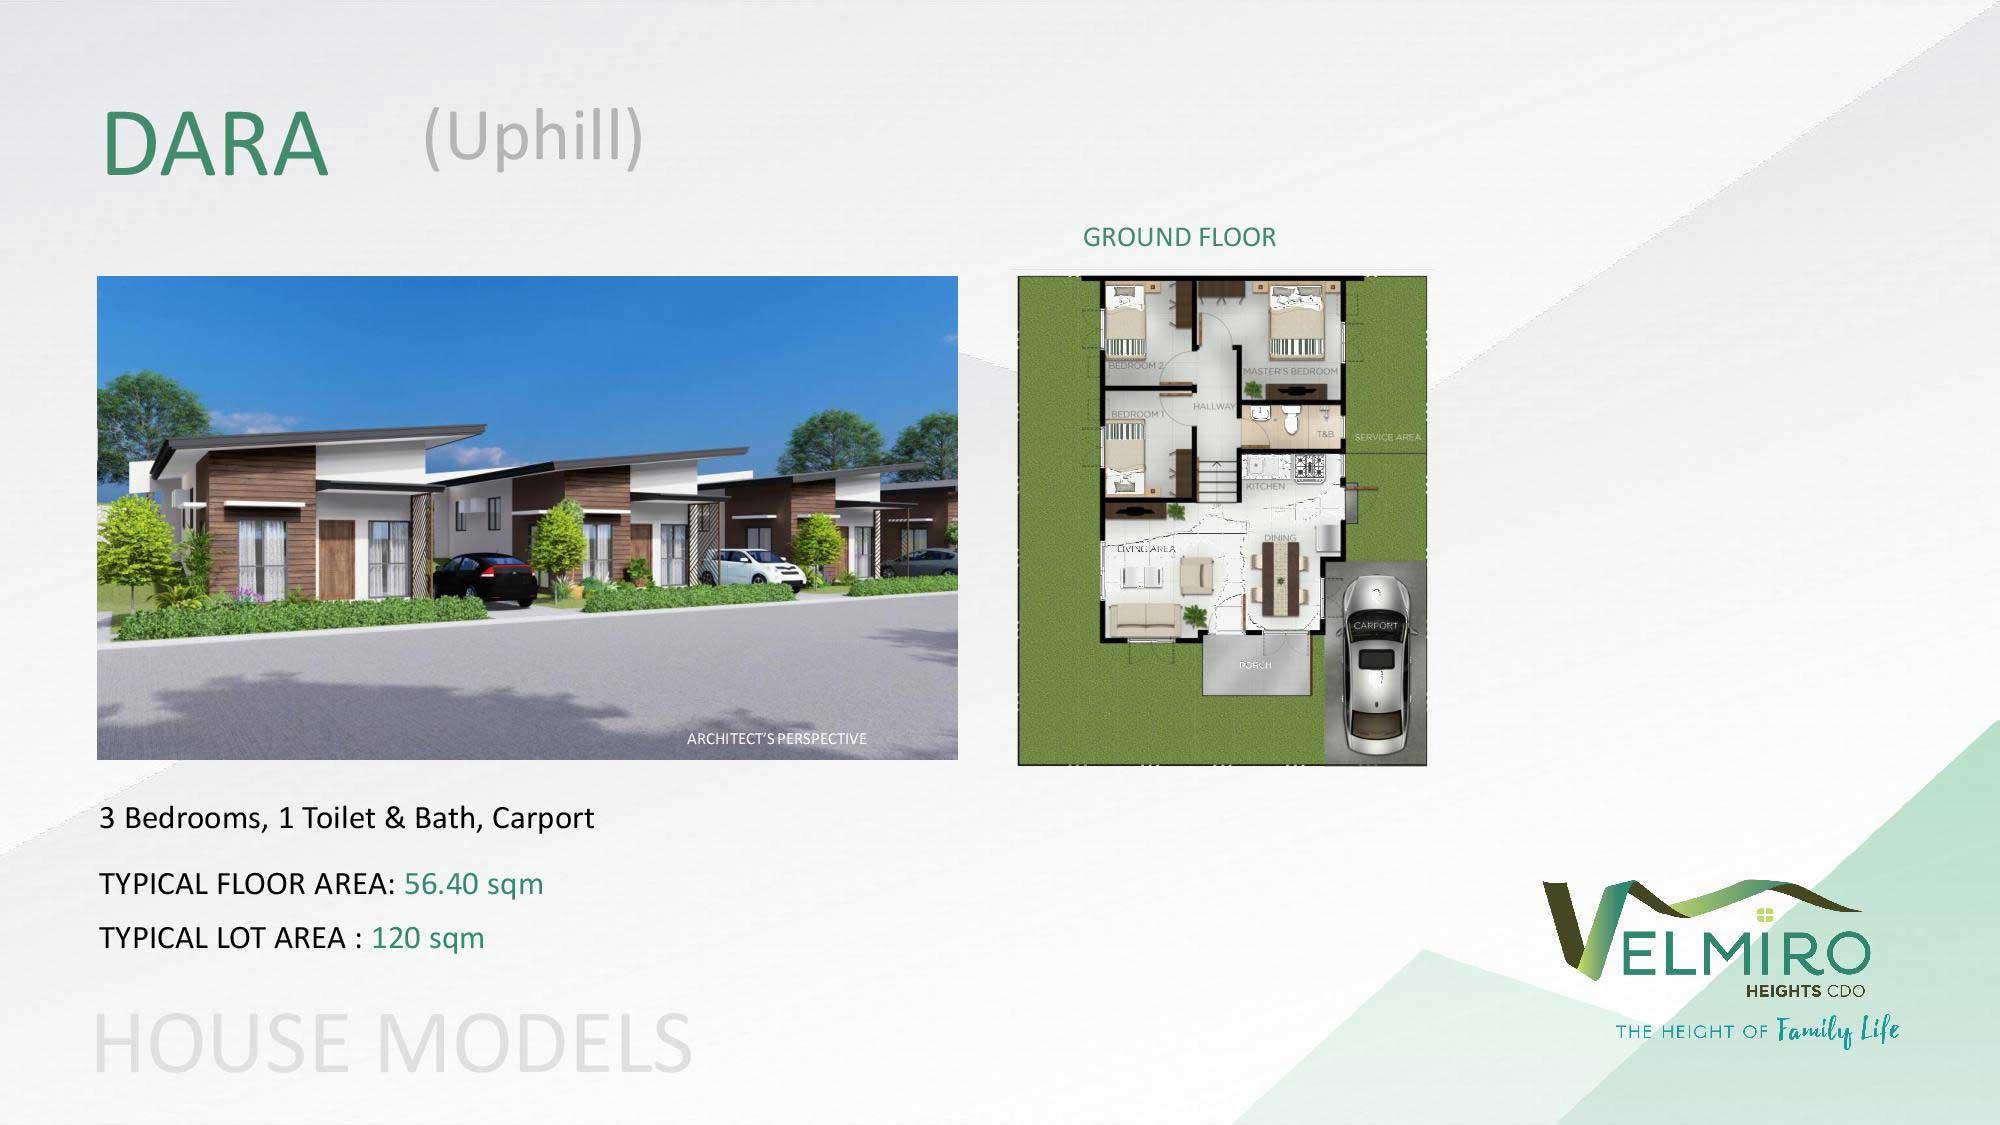 Velmiro heights agusan house model dara uphill web gmc